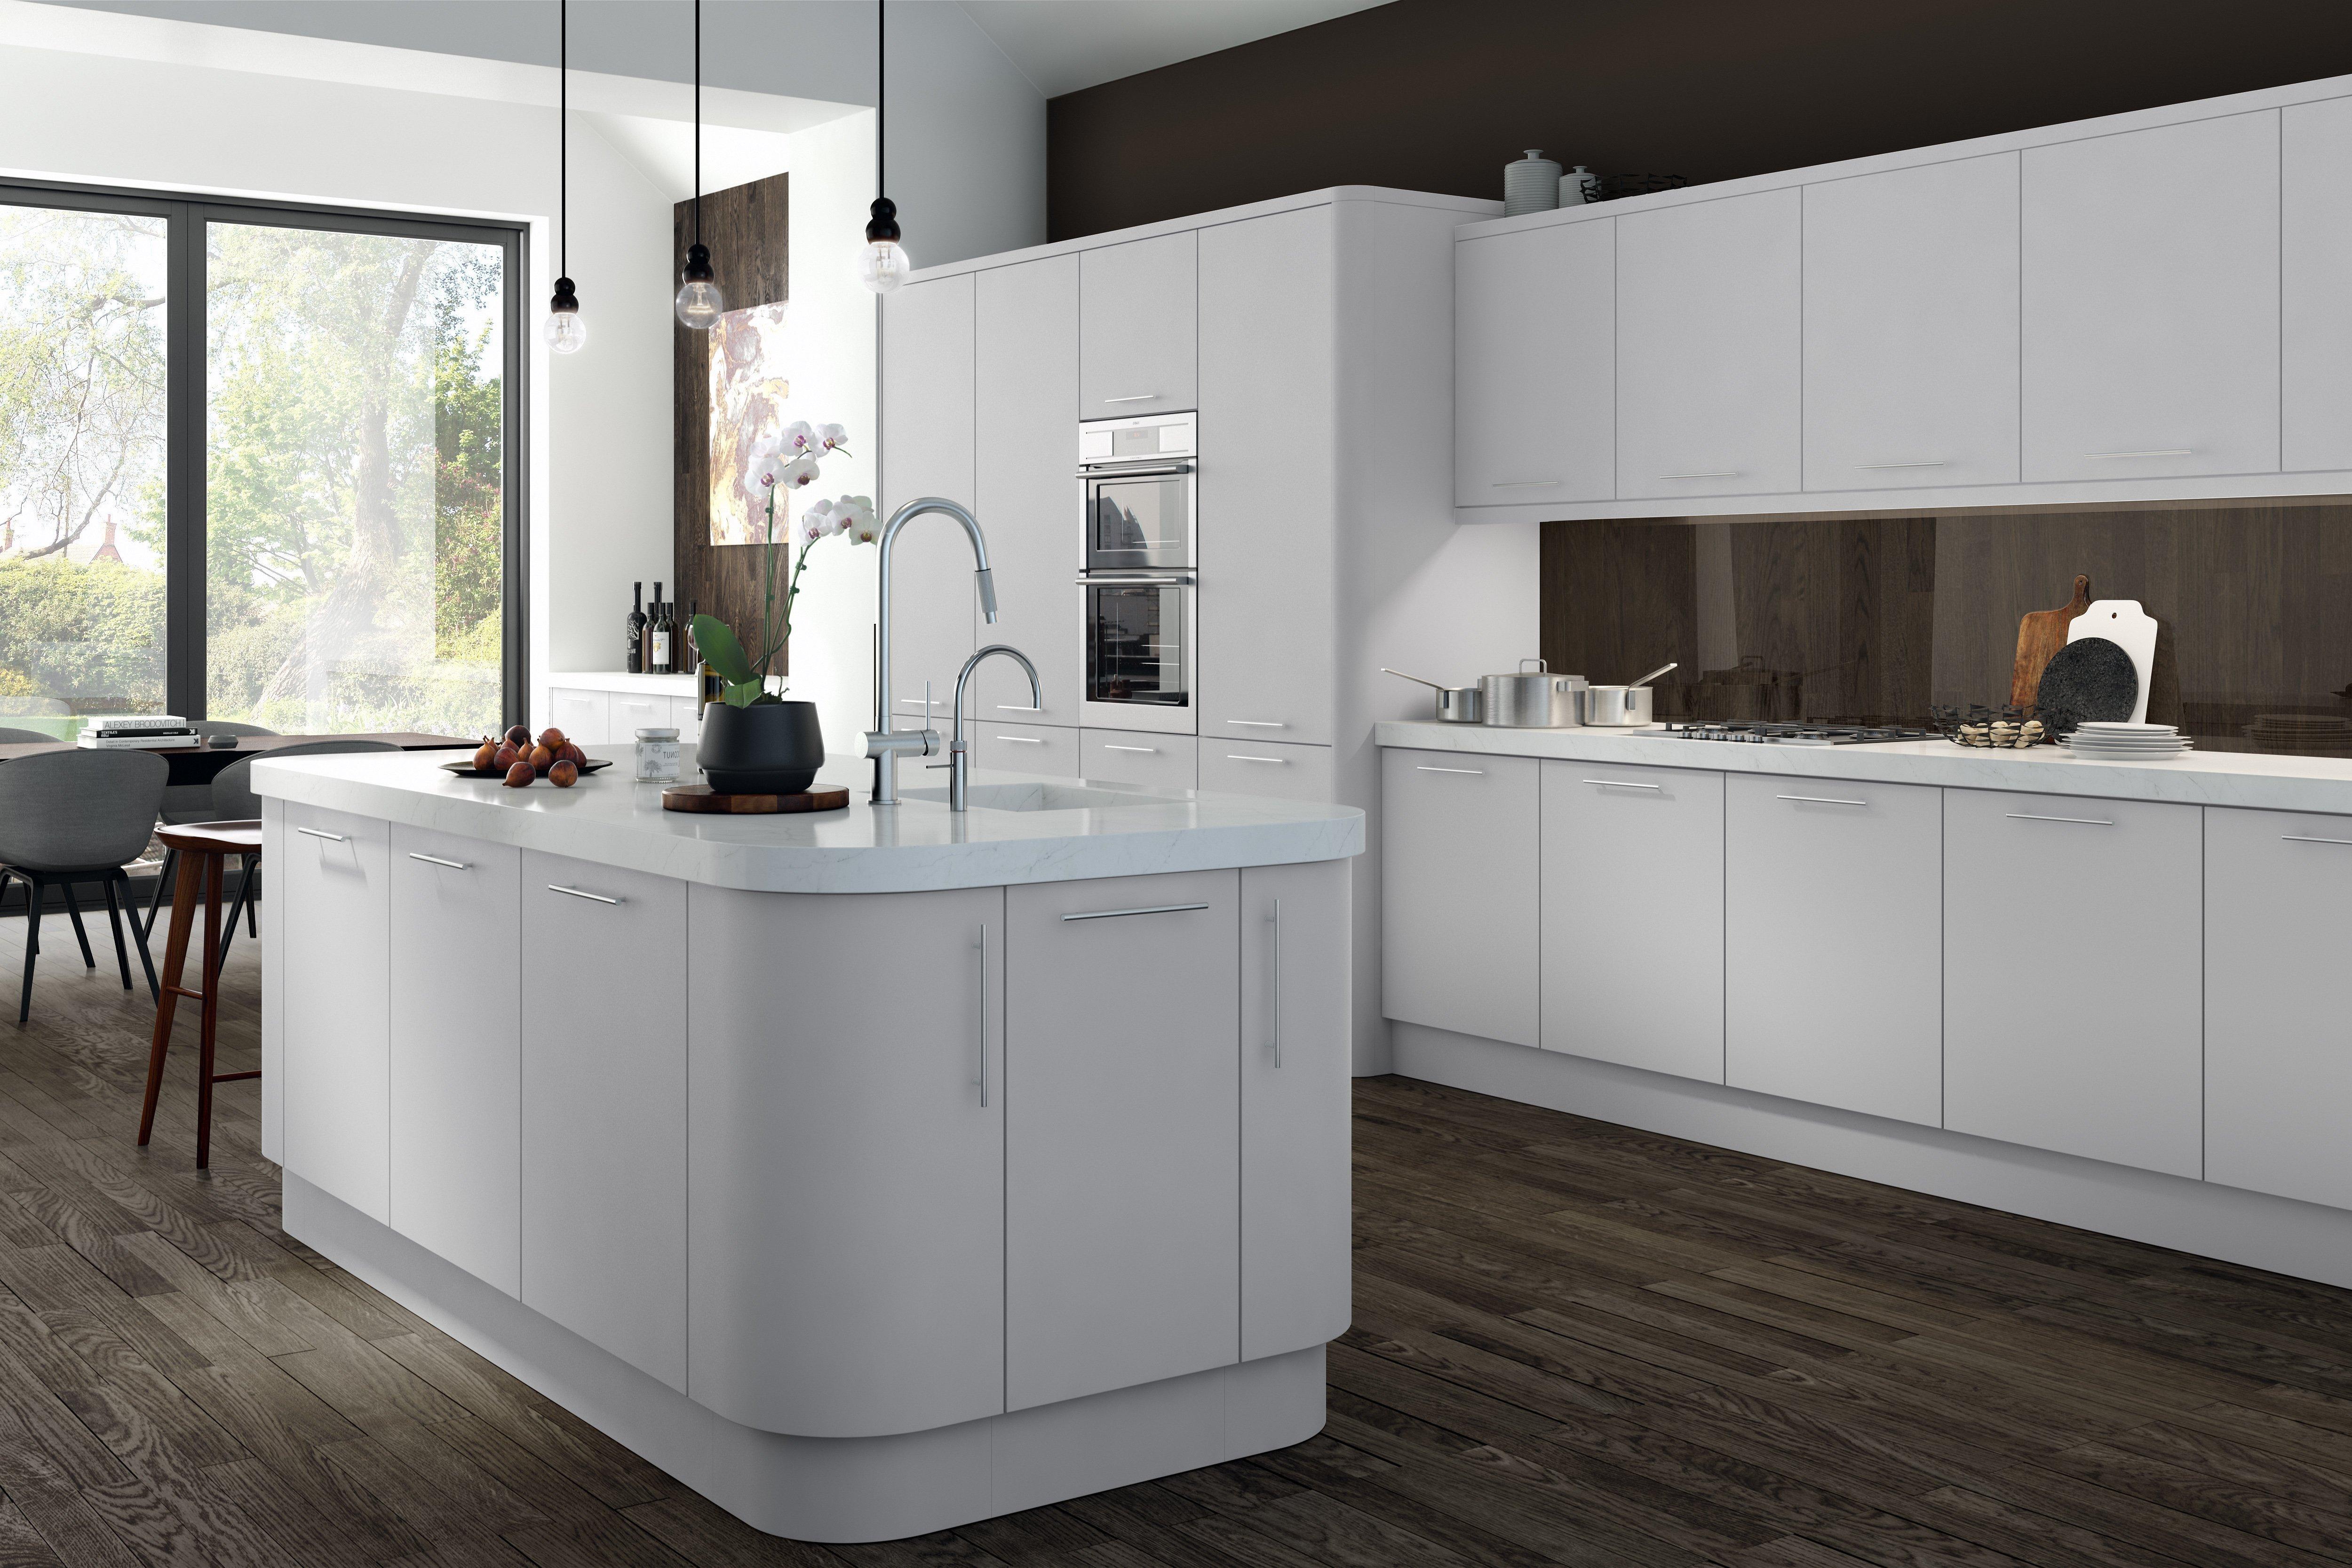 get a unique kitchen at the trade kitchen centre in glasgow